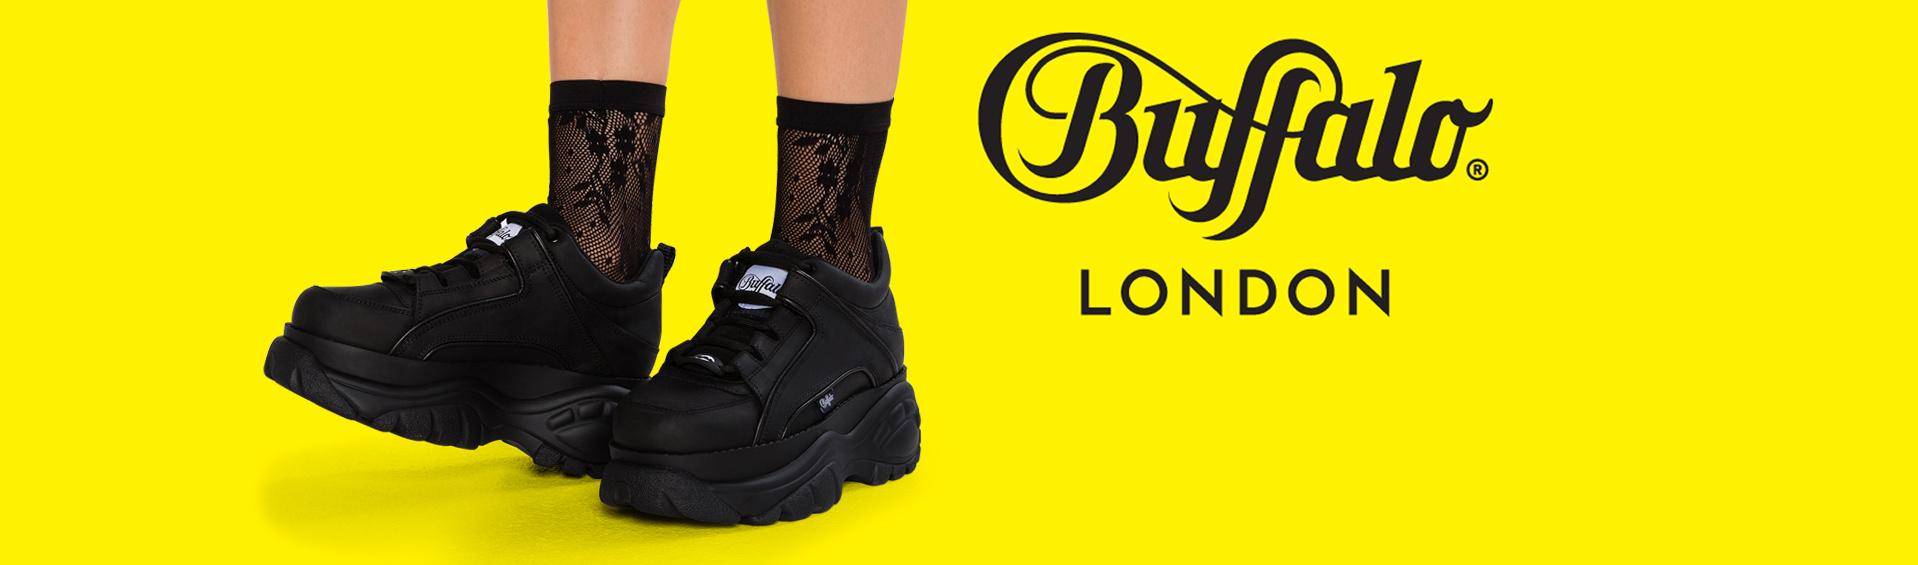 Buffalo-London-Sneakers-Scarpelli-Calzature